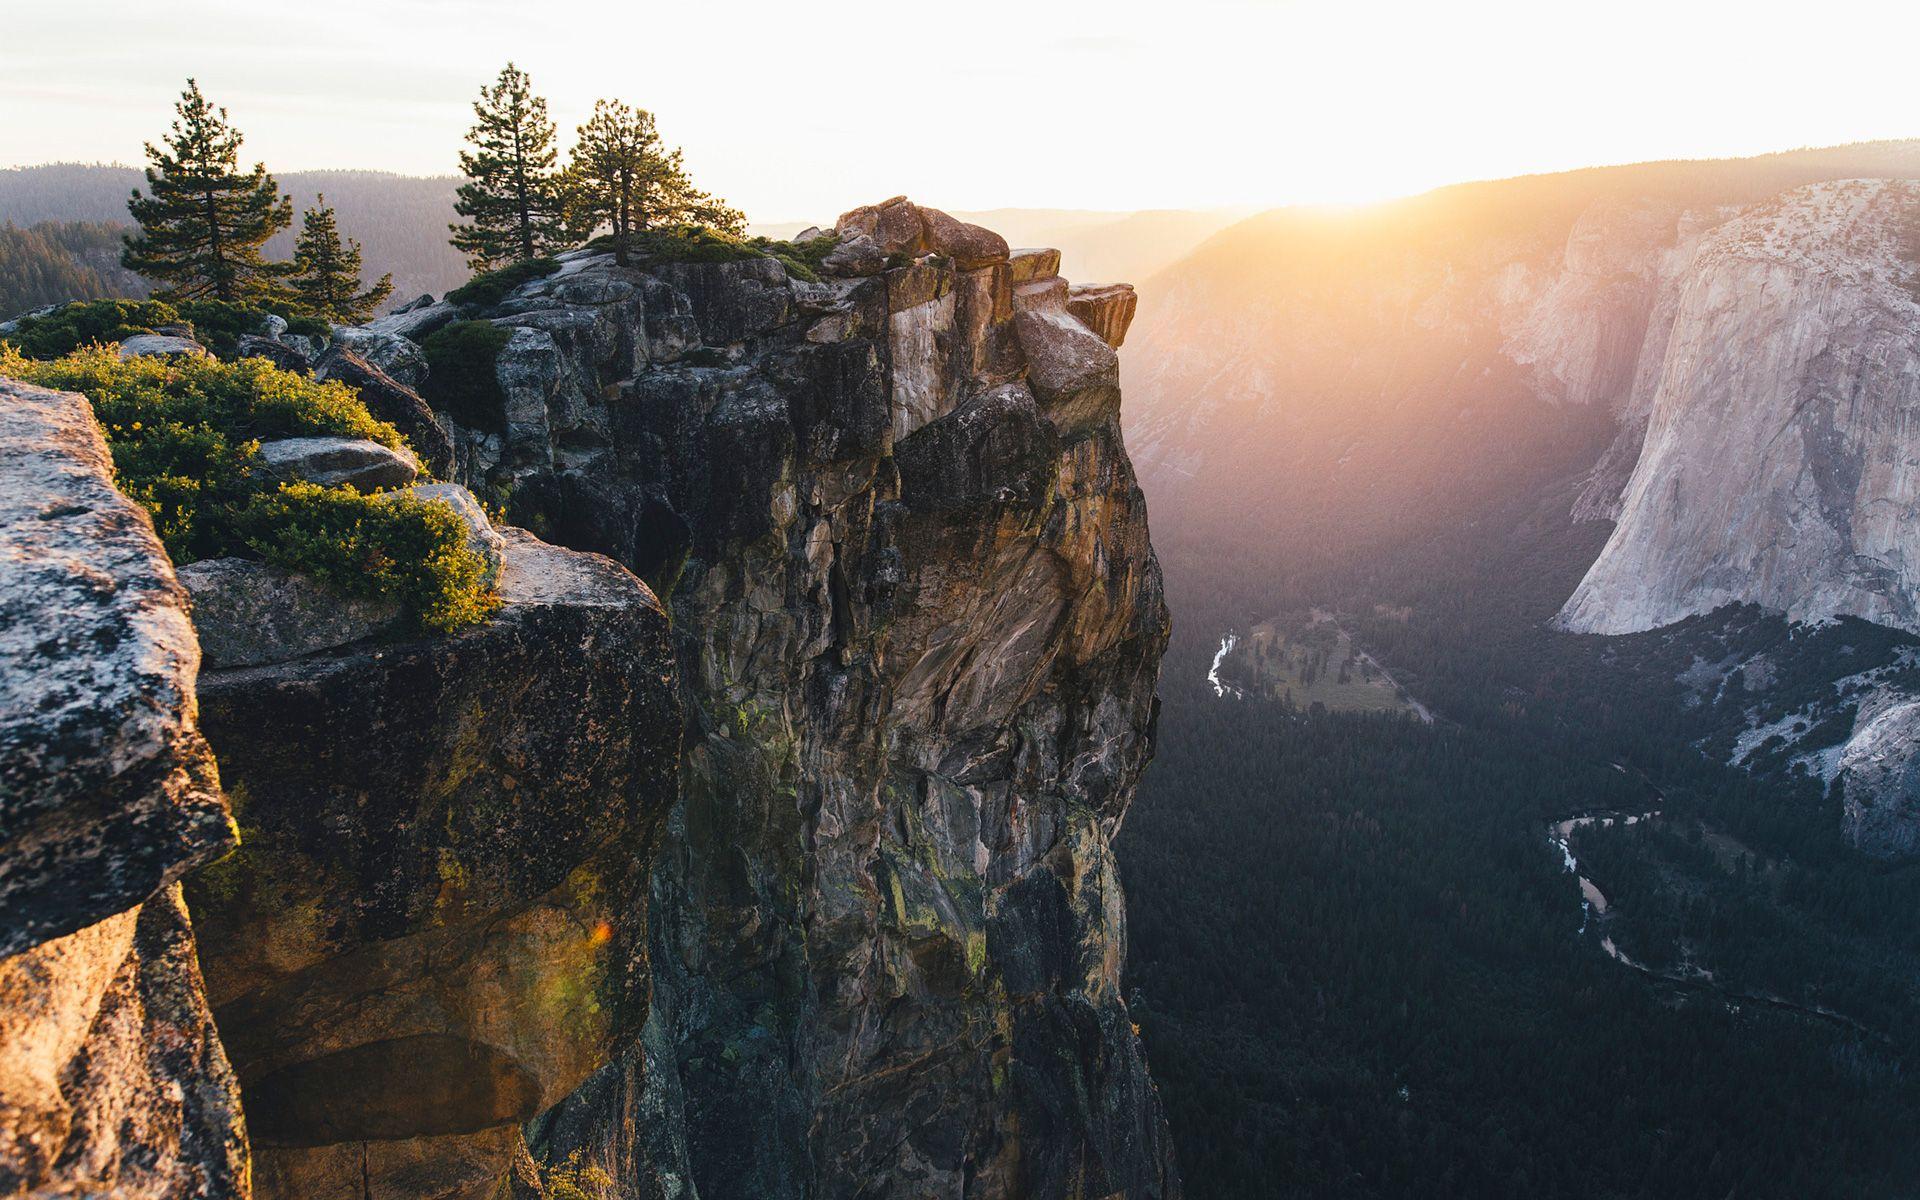 Yosemite Cliff Edge HD Wallpaper From Gallsource com | HD